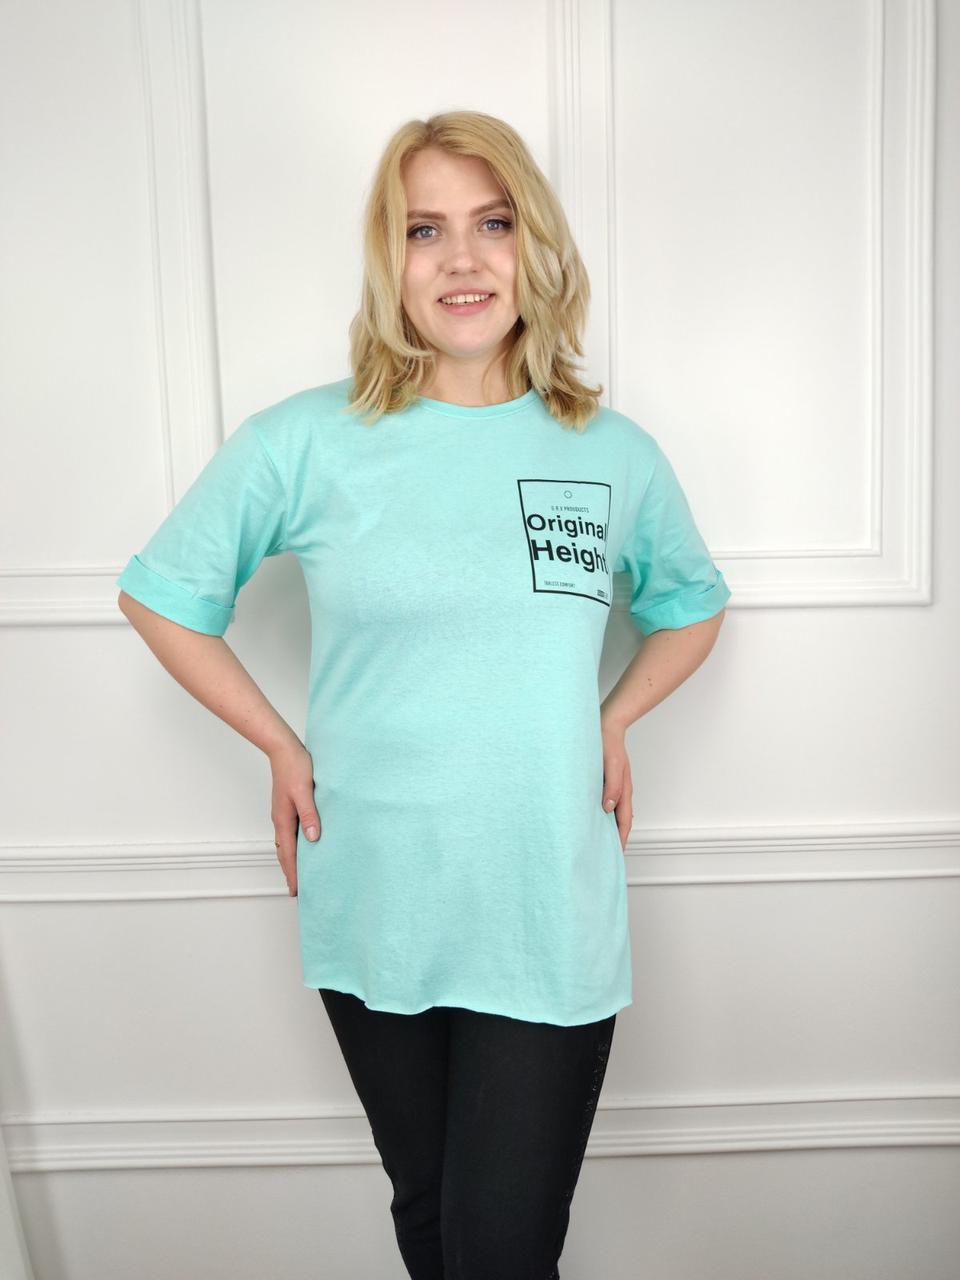 Женская футболка полу батал, 50-52-54рр, надписи, голубой